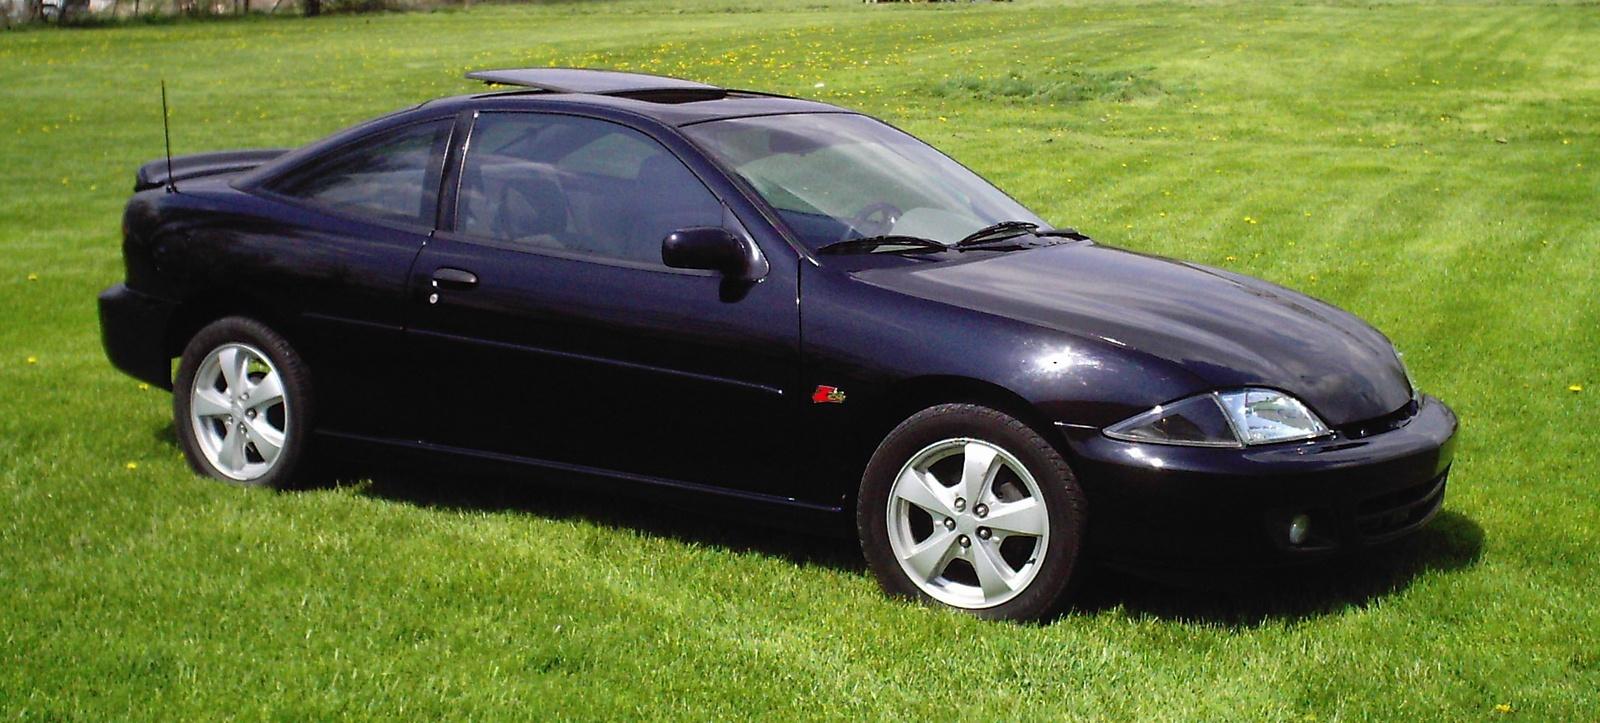 Chevrolet Cavalier 2000 foto - 4